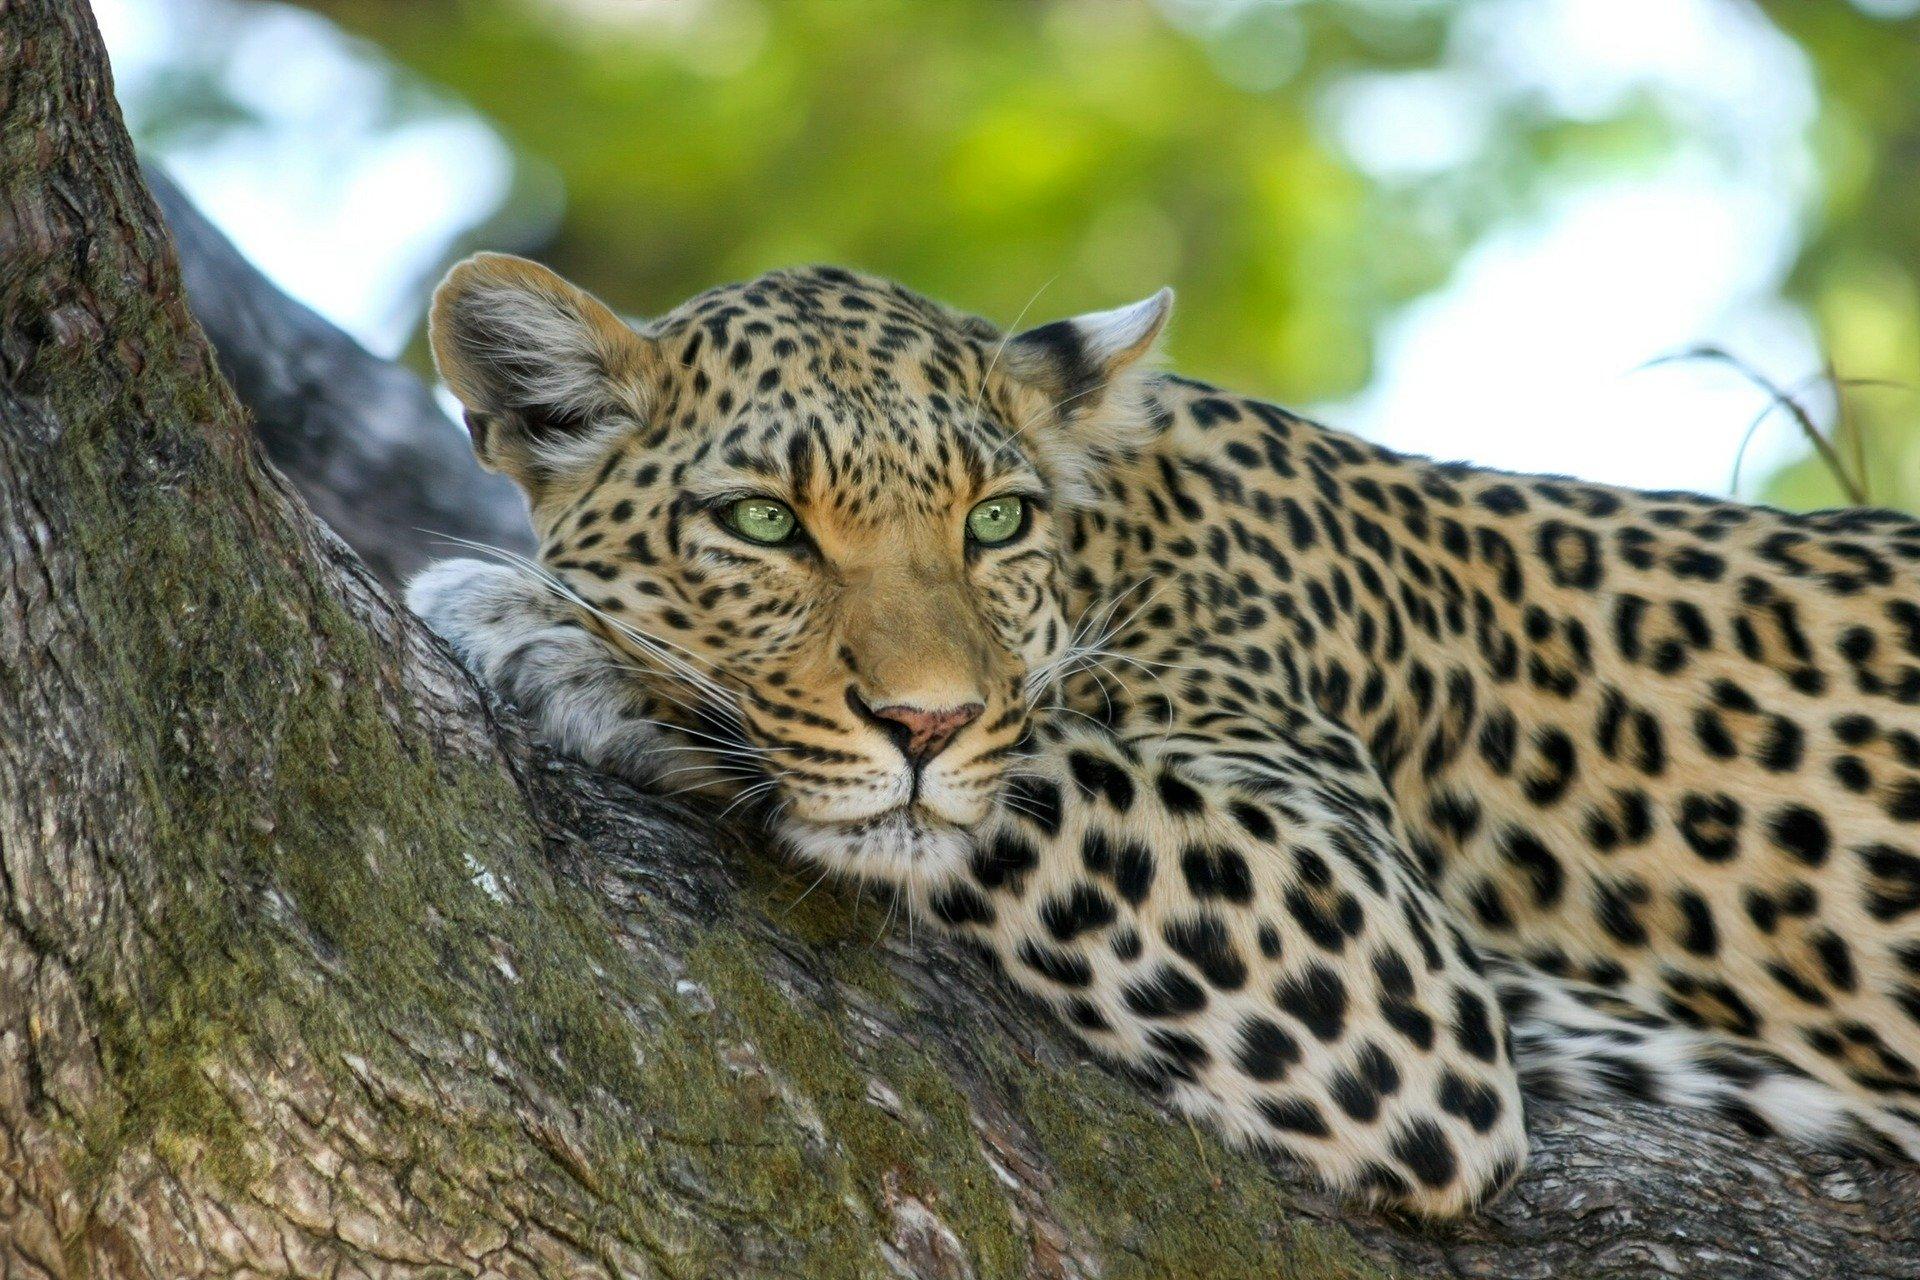 Leopardo en Botswana - The Indiana Travel - Viajes a Botswana